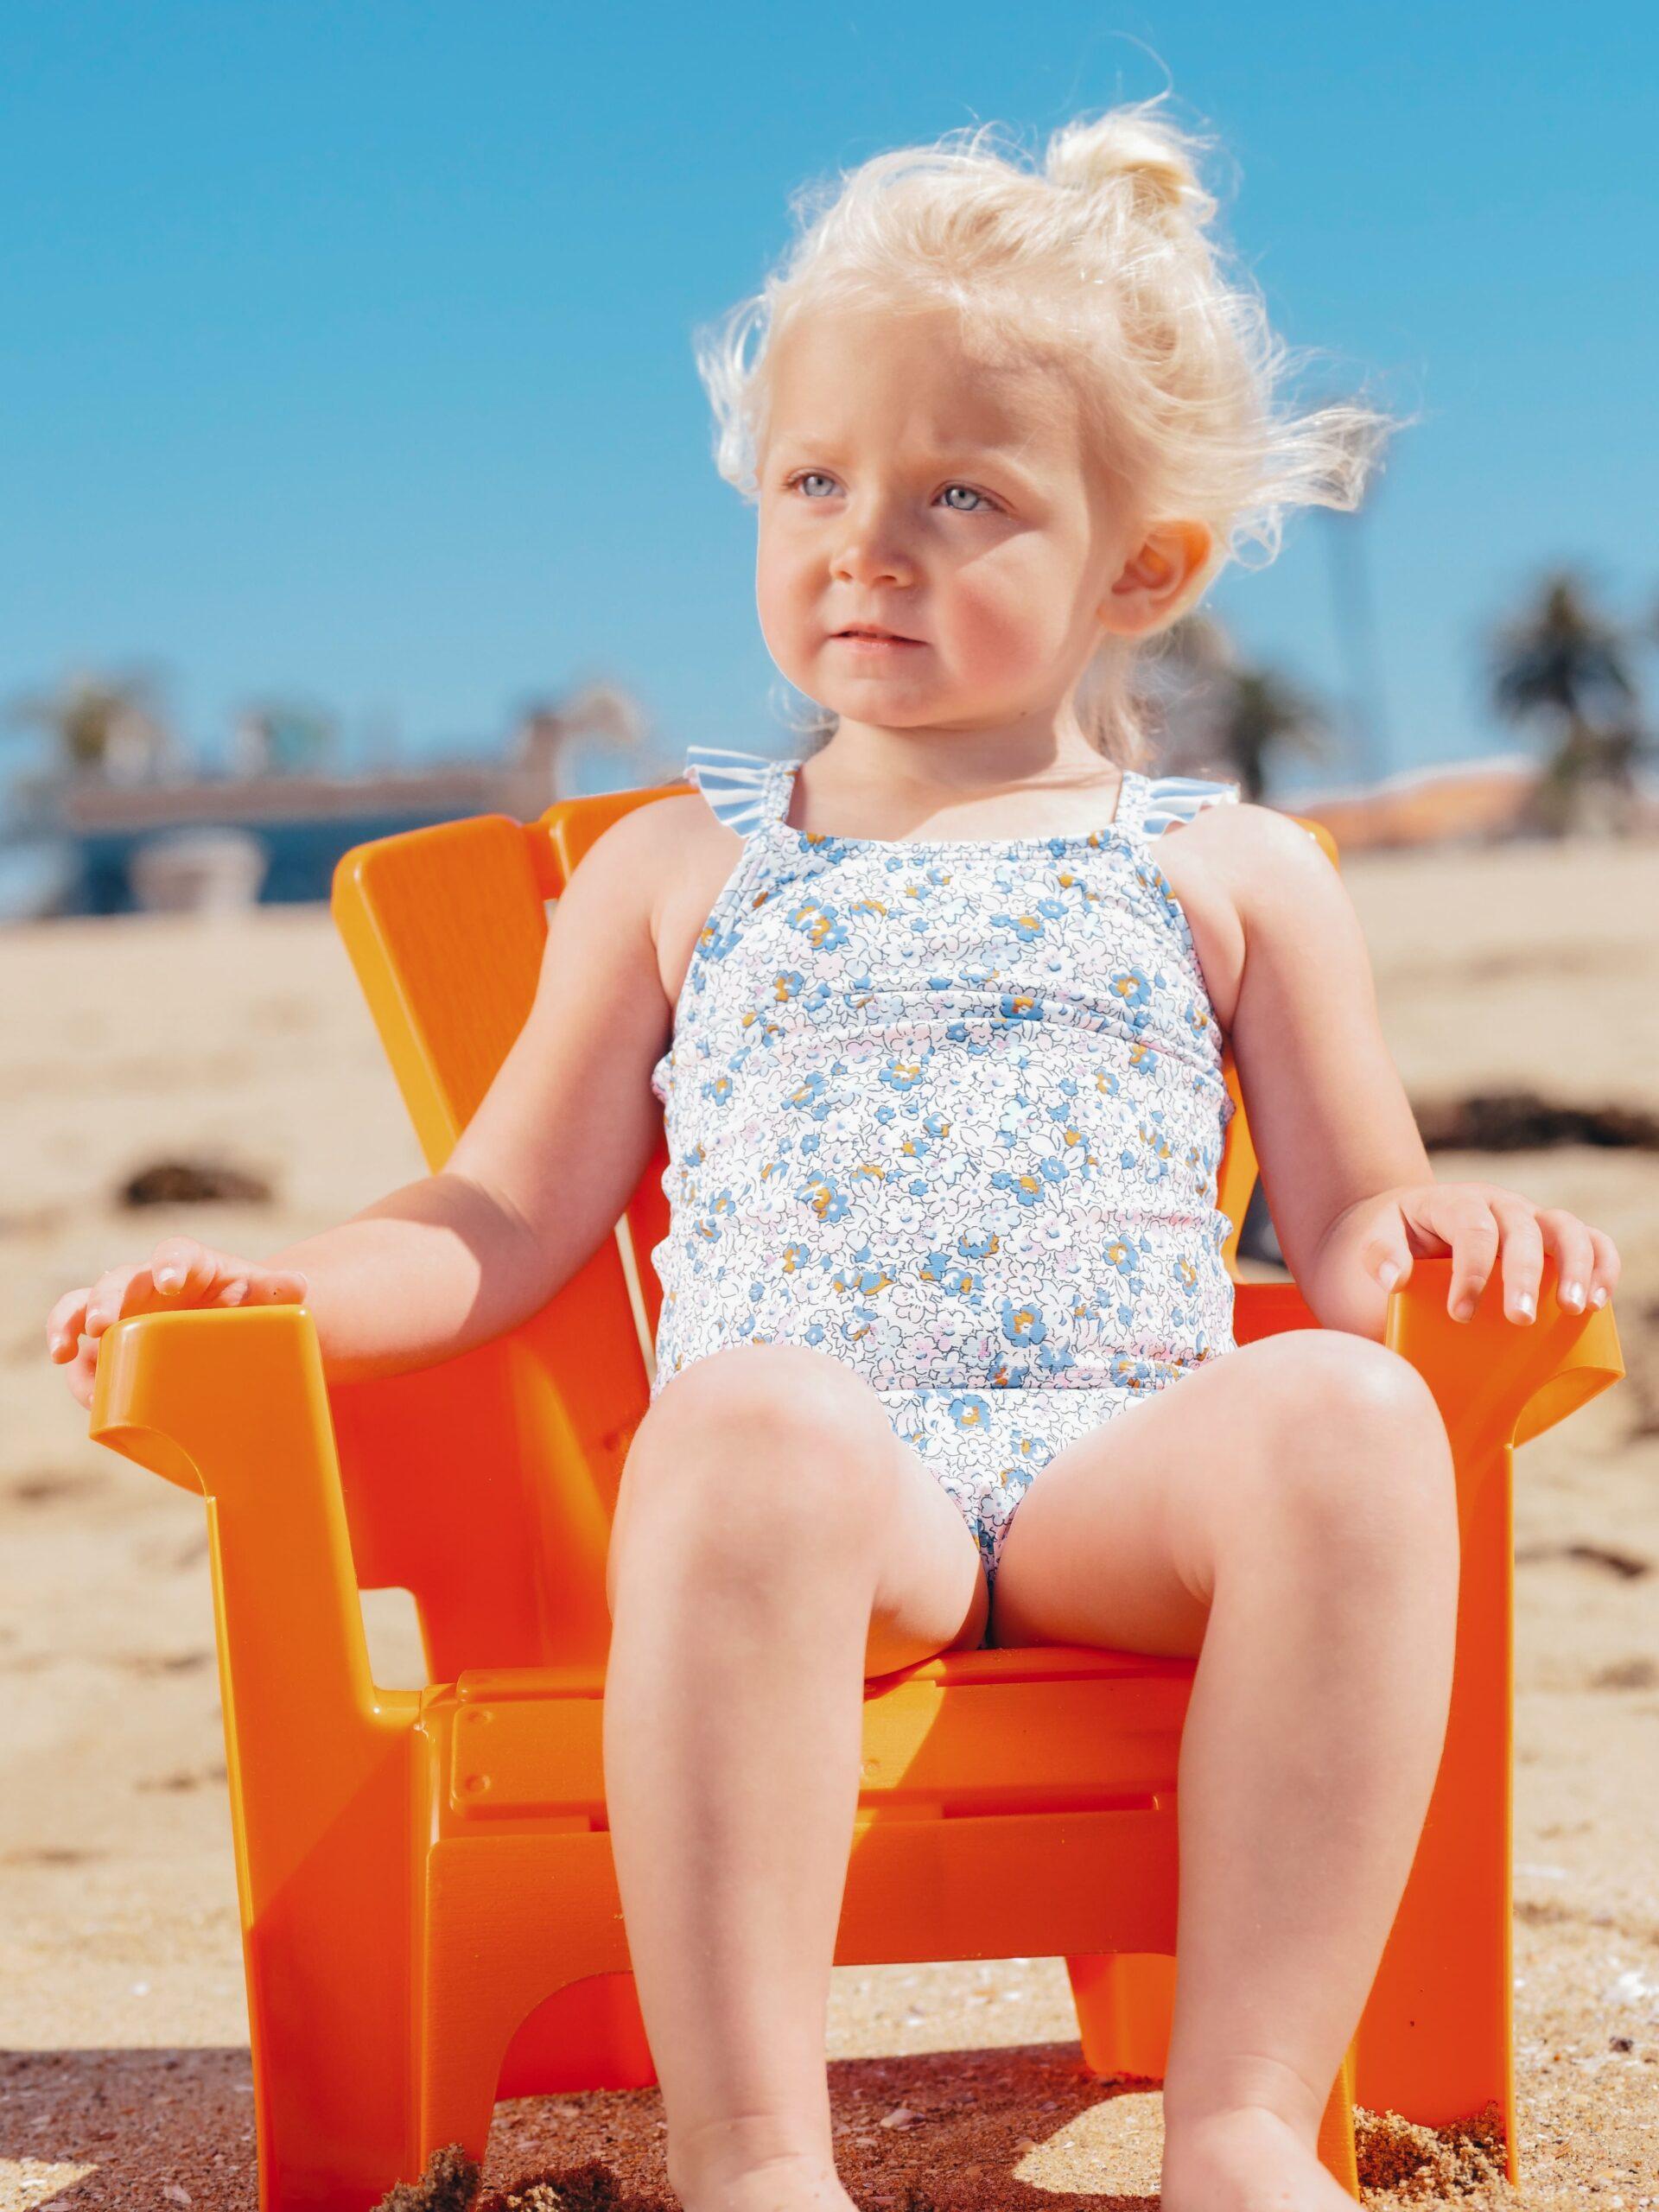 Blonde girl sitting in chair on beach